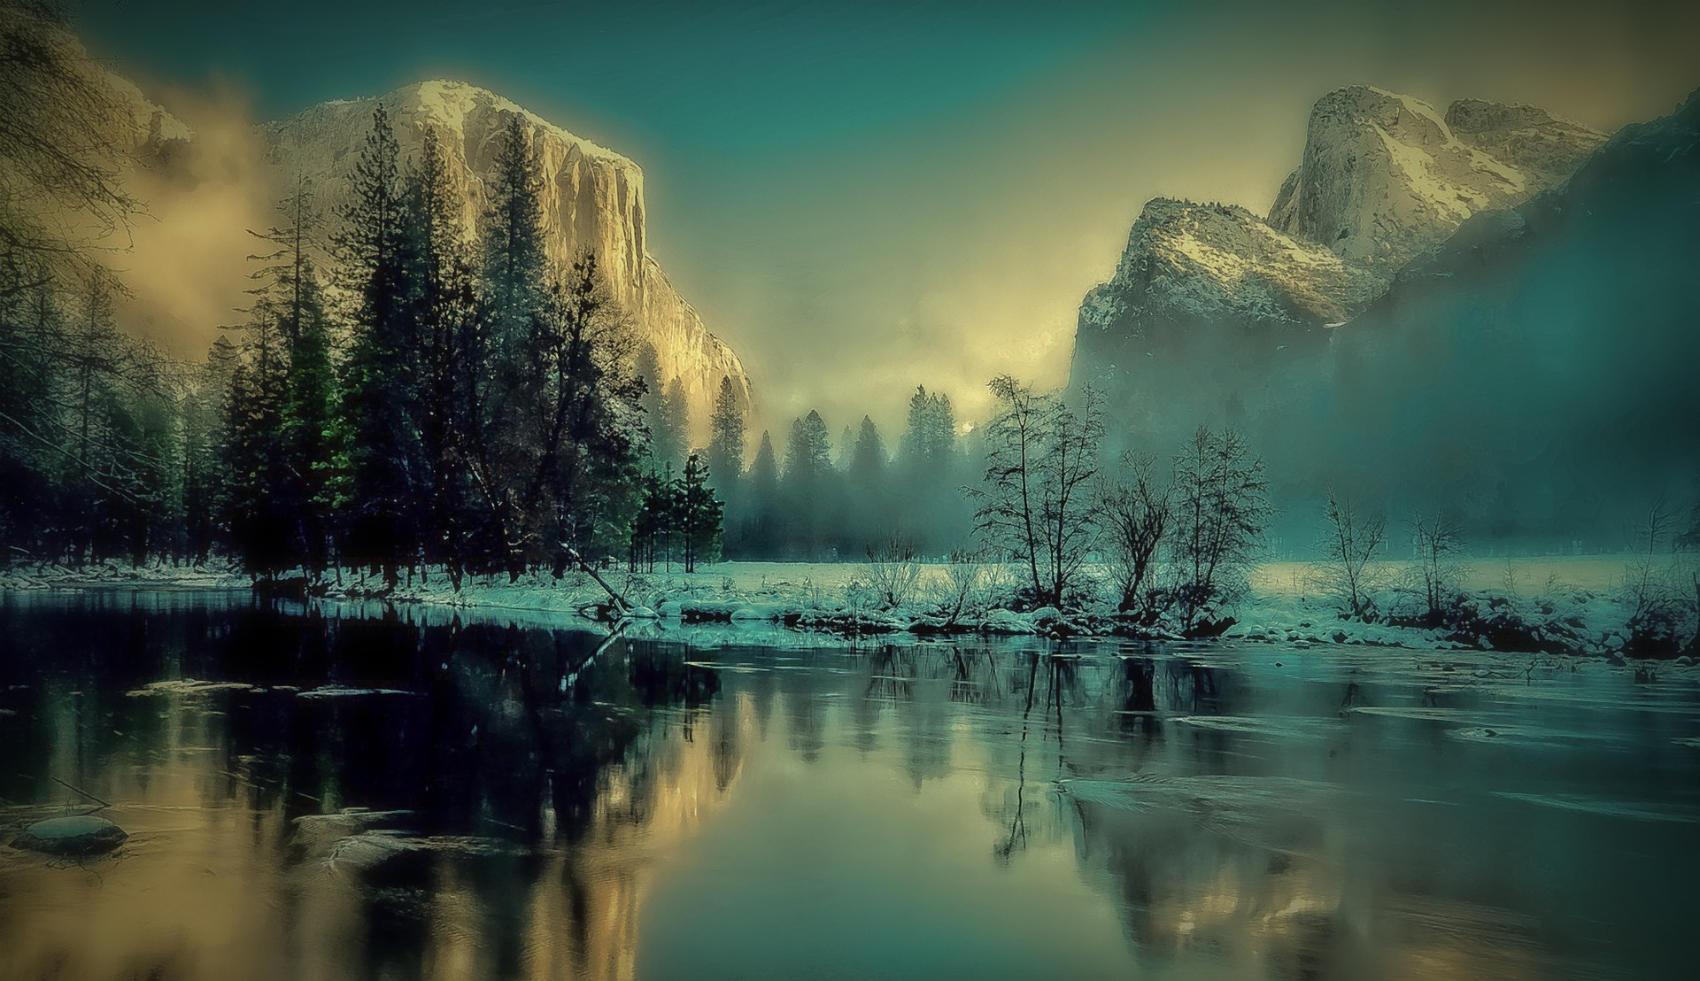 Yosemite Park Landscape - Image by Gerd Altmann